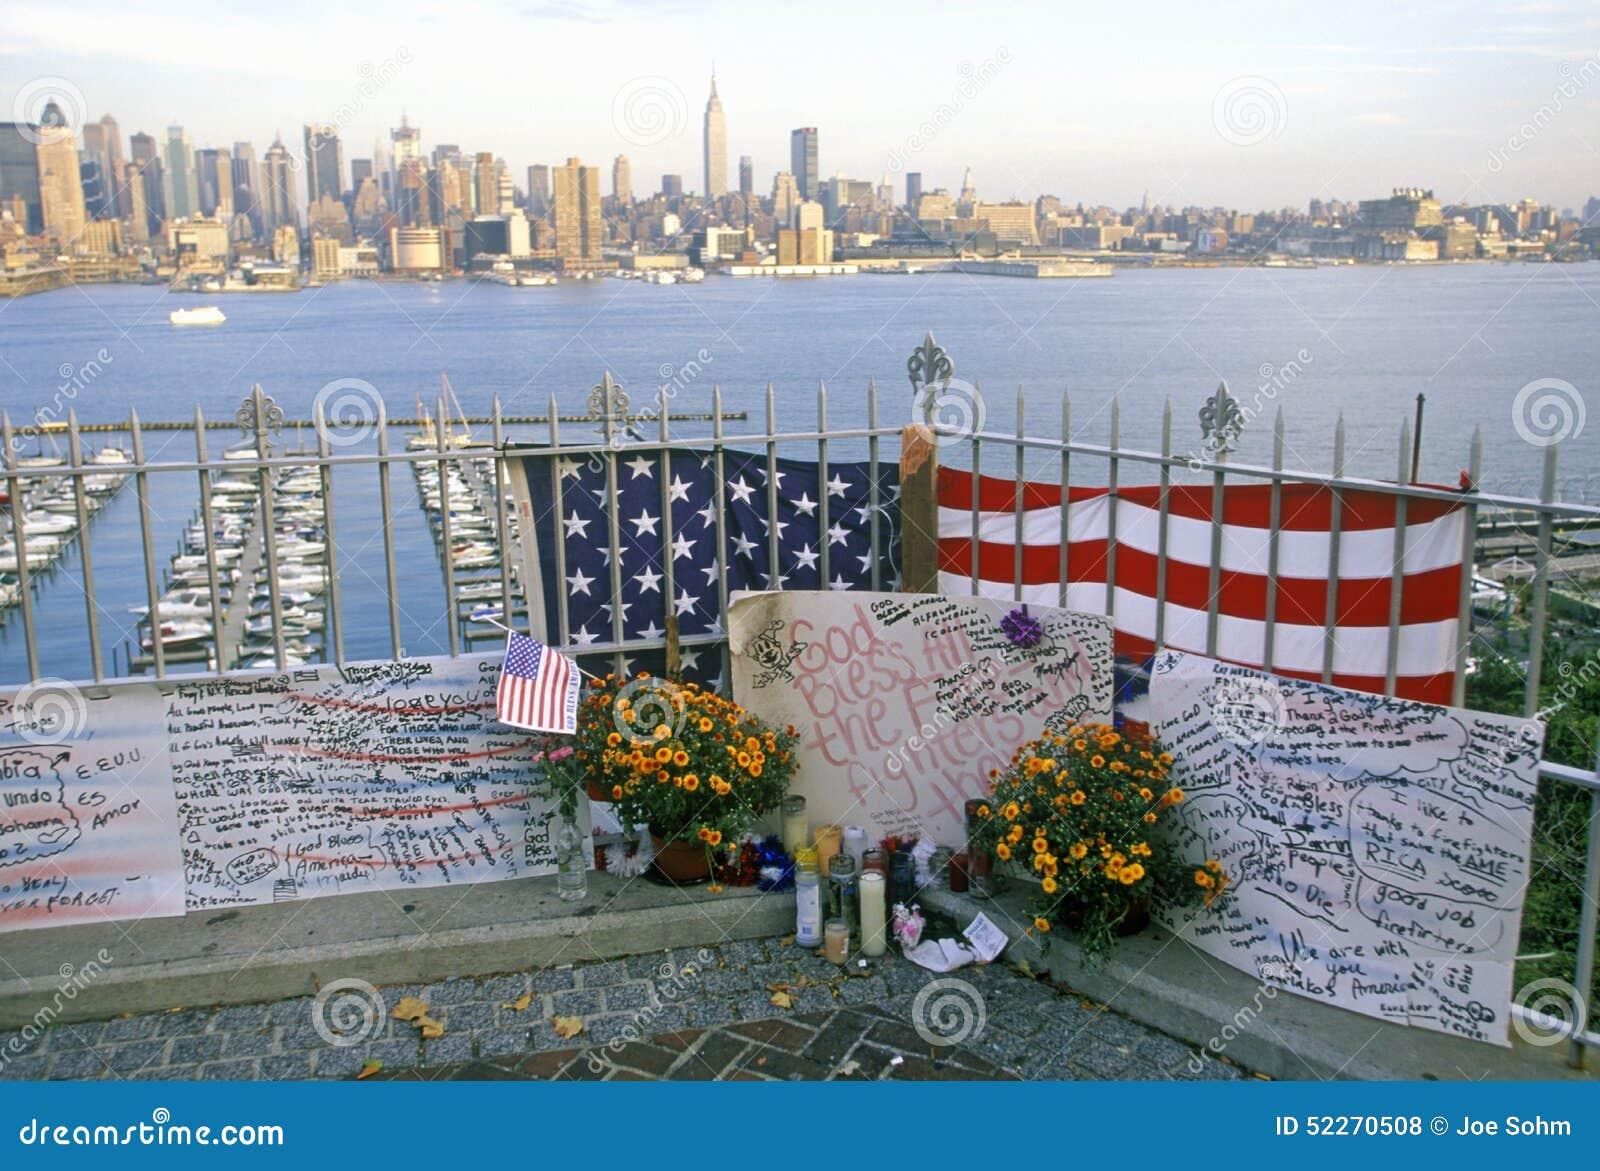 September 11 2001 Memorial On Rooftop Looking Over